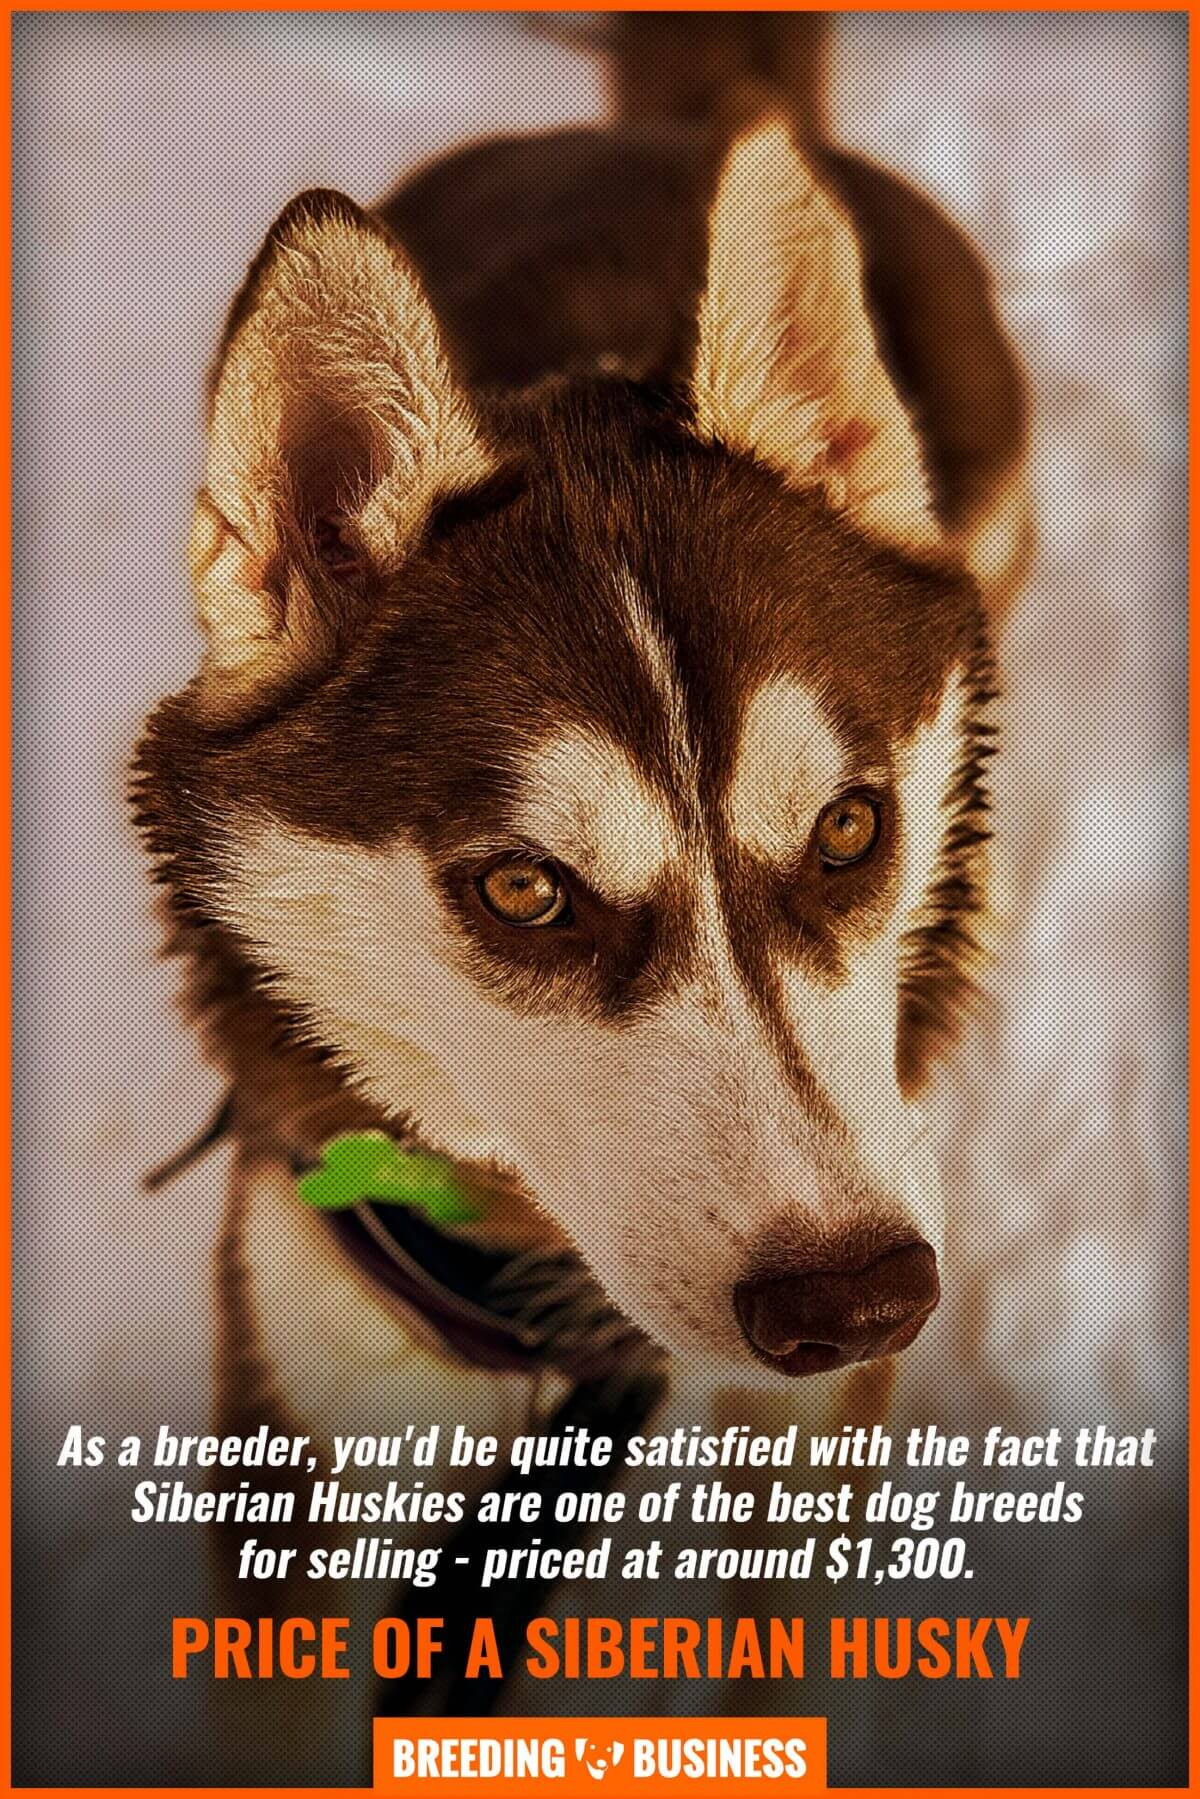 price of a siberian husky